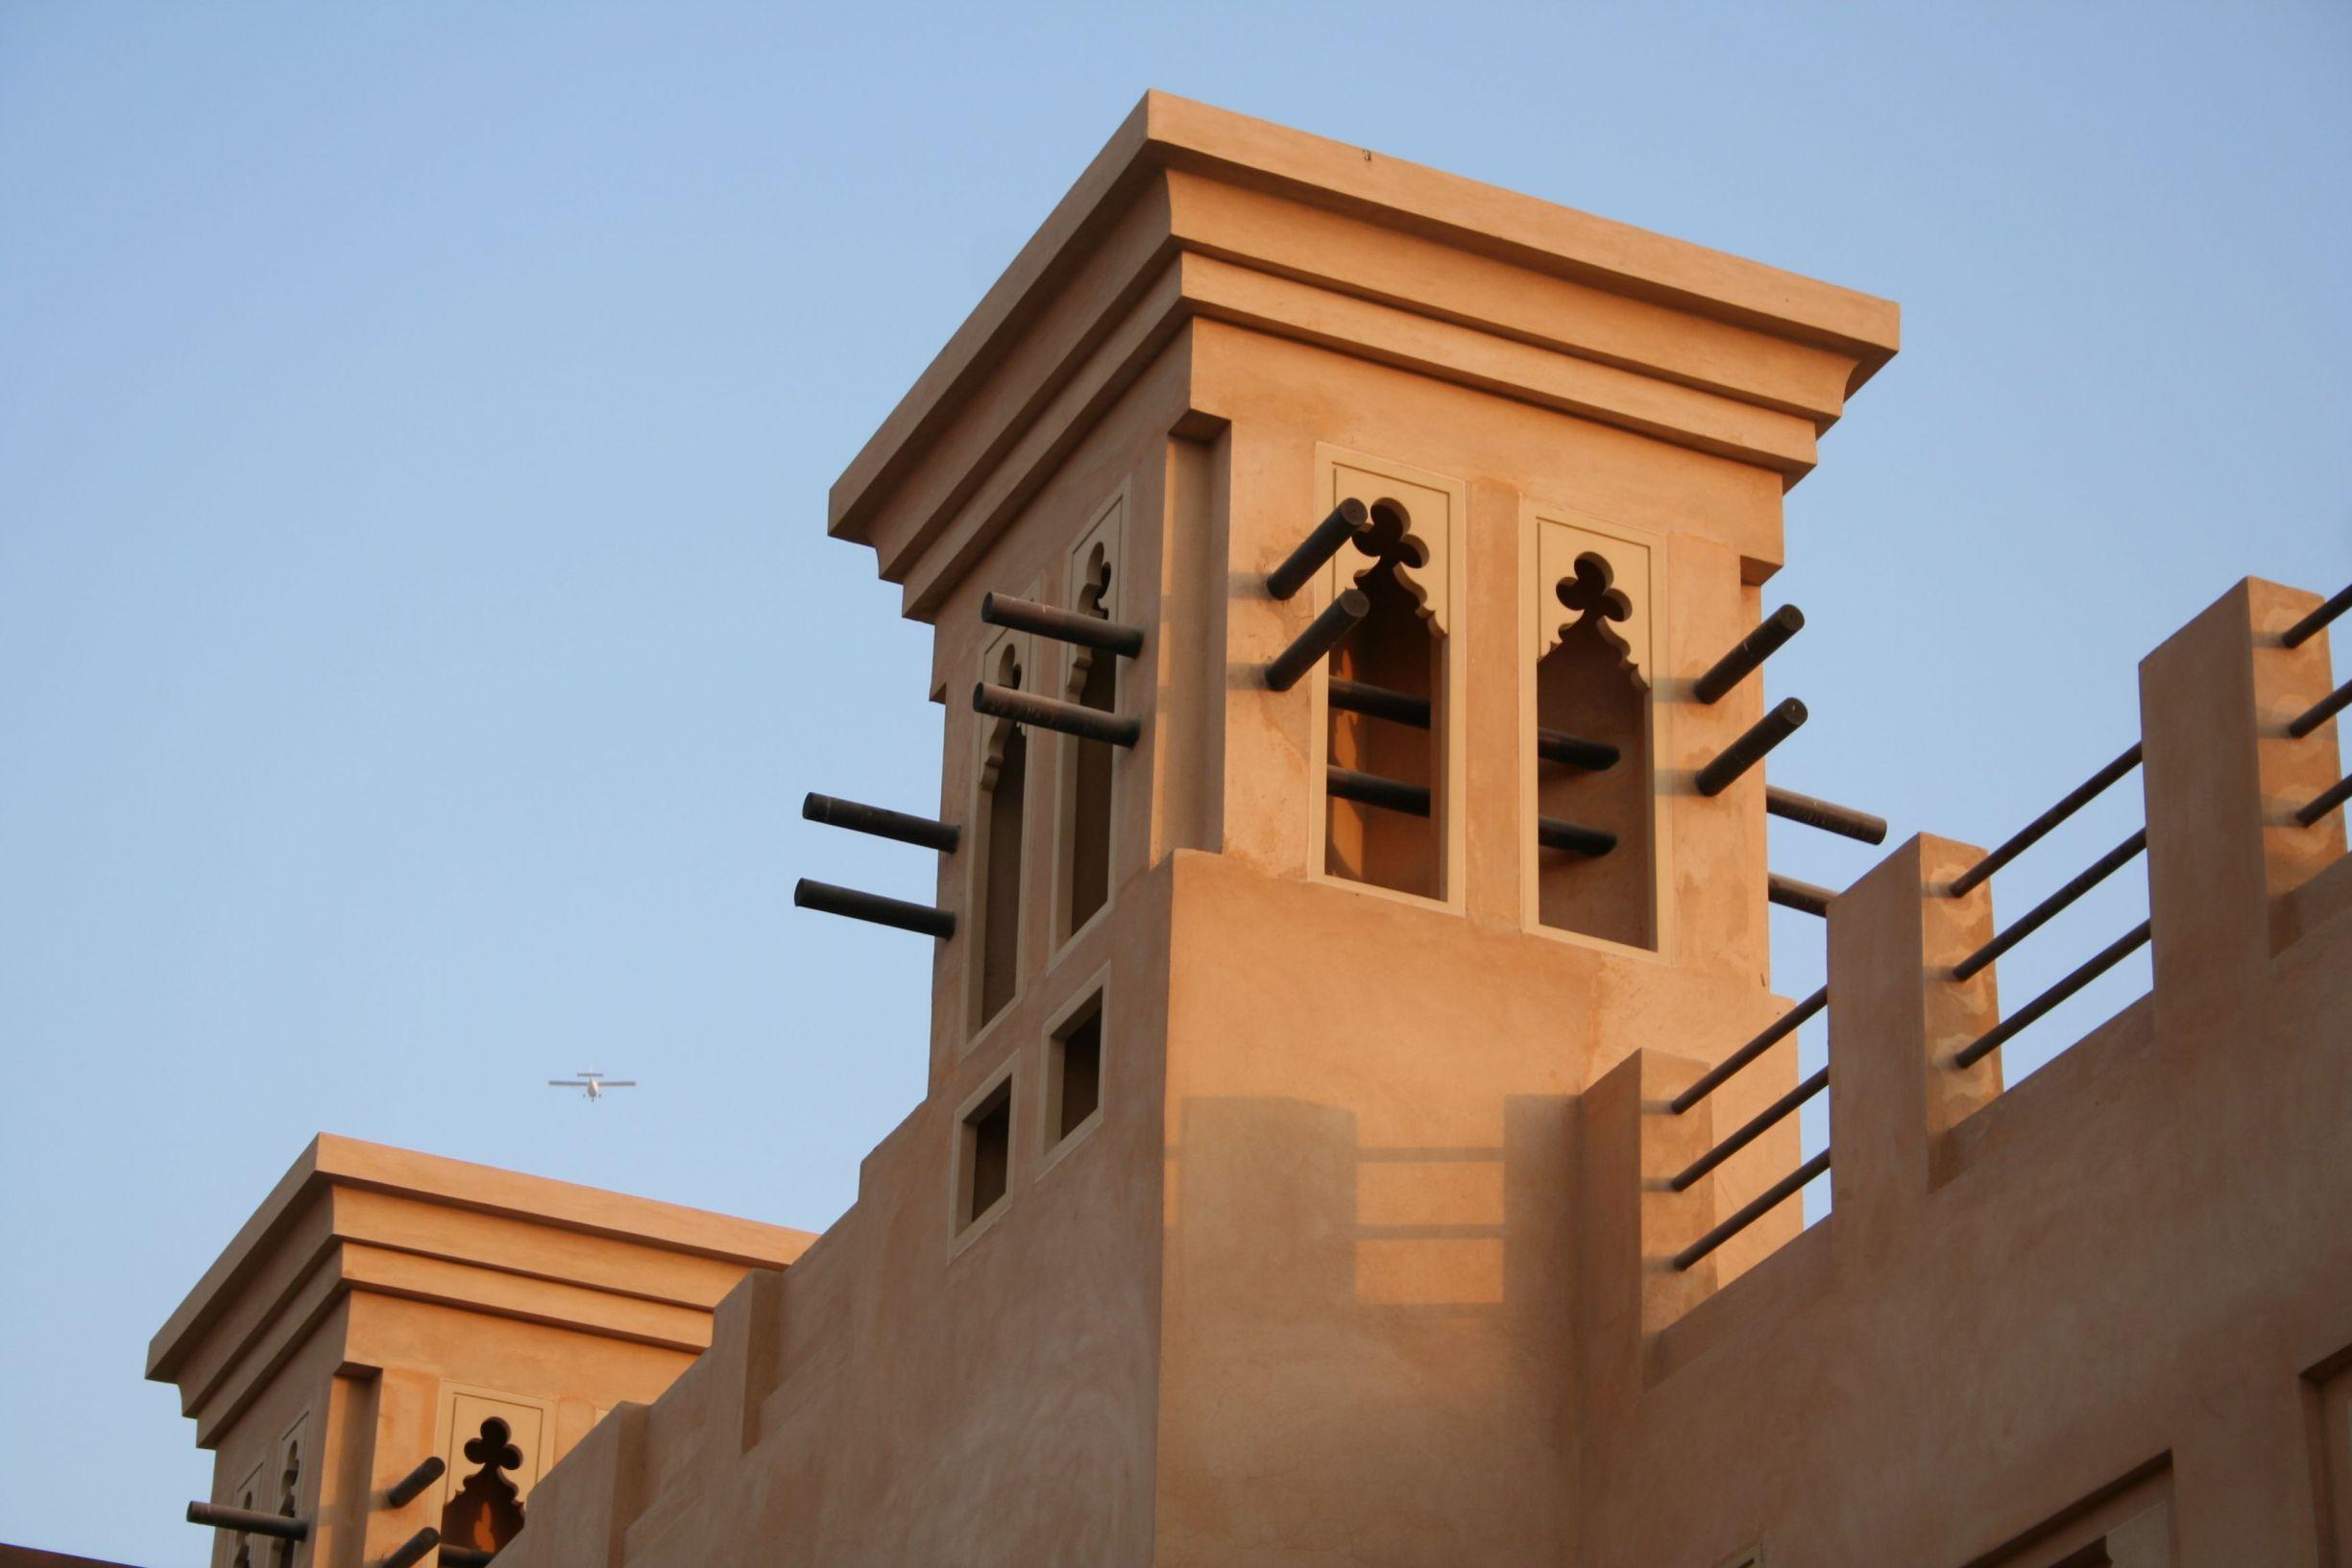 Traditional wind towers of Ras Al Khaimah, UAE